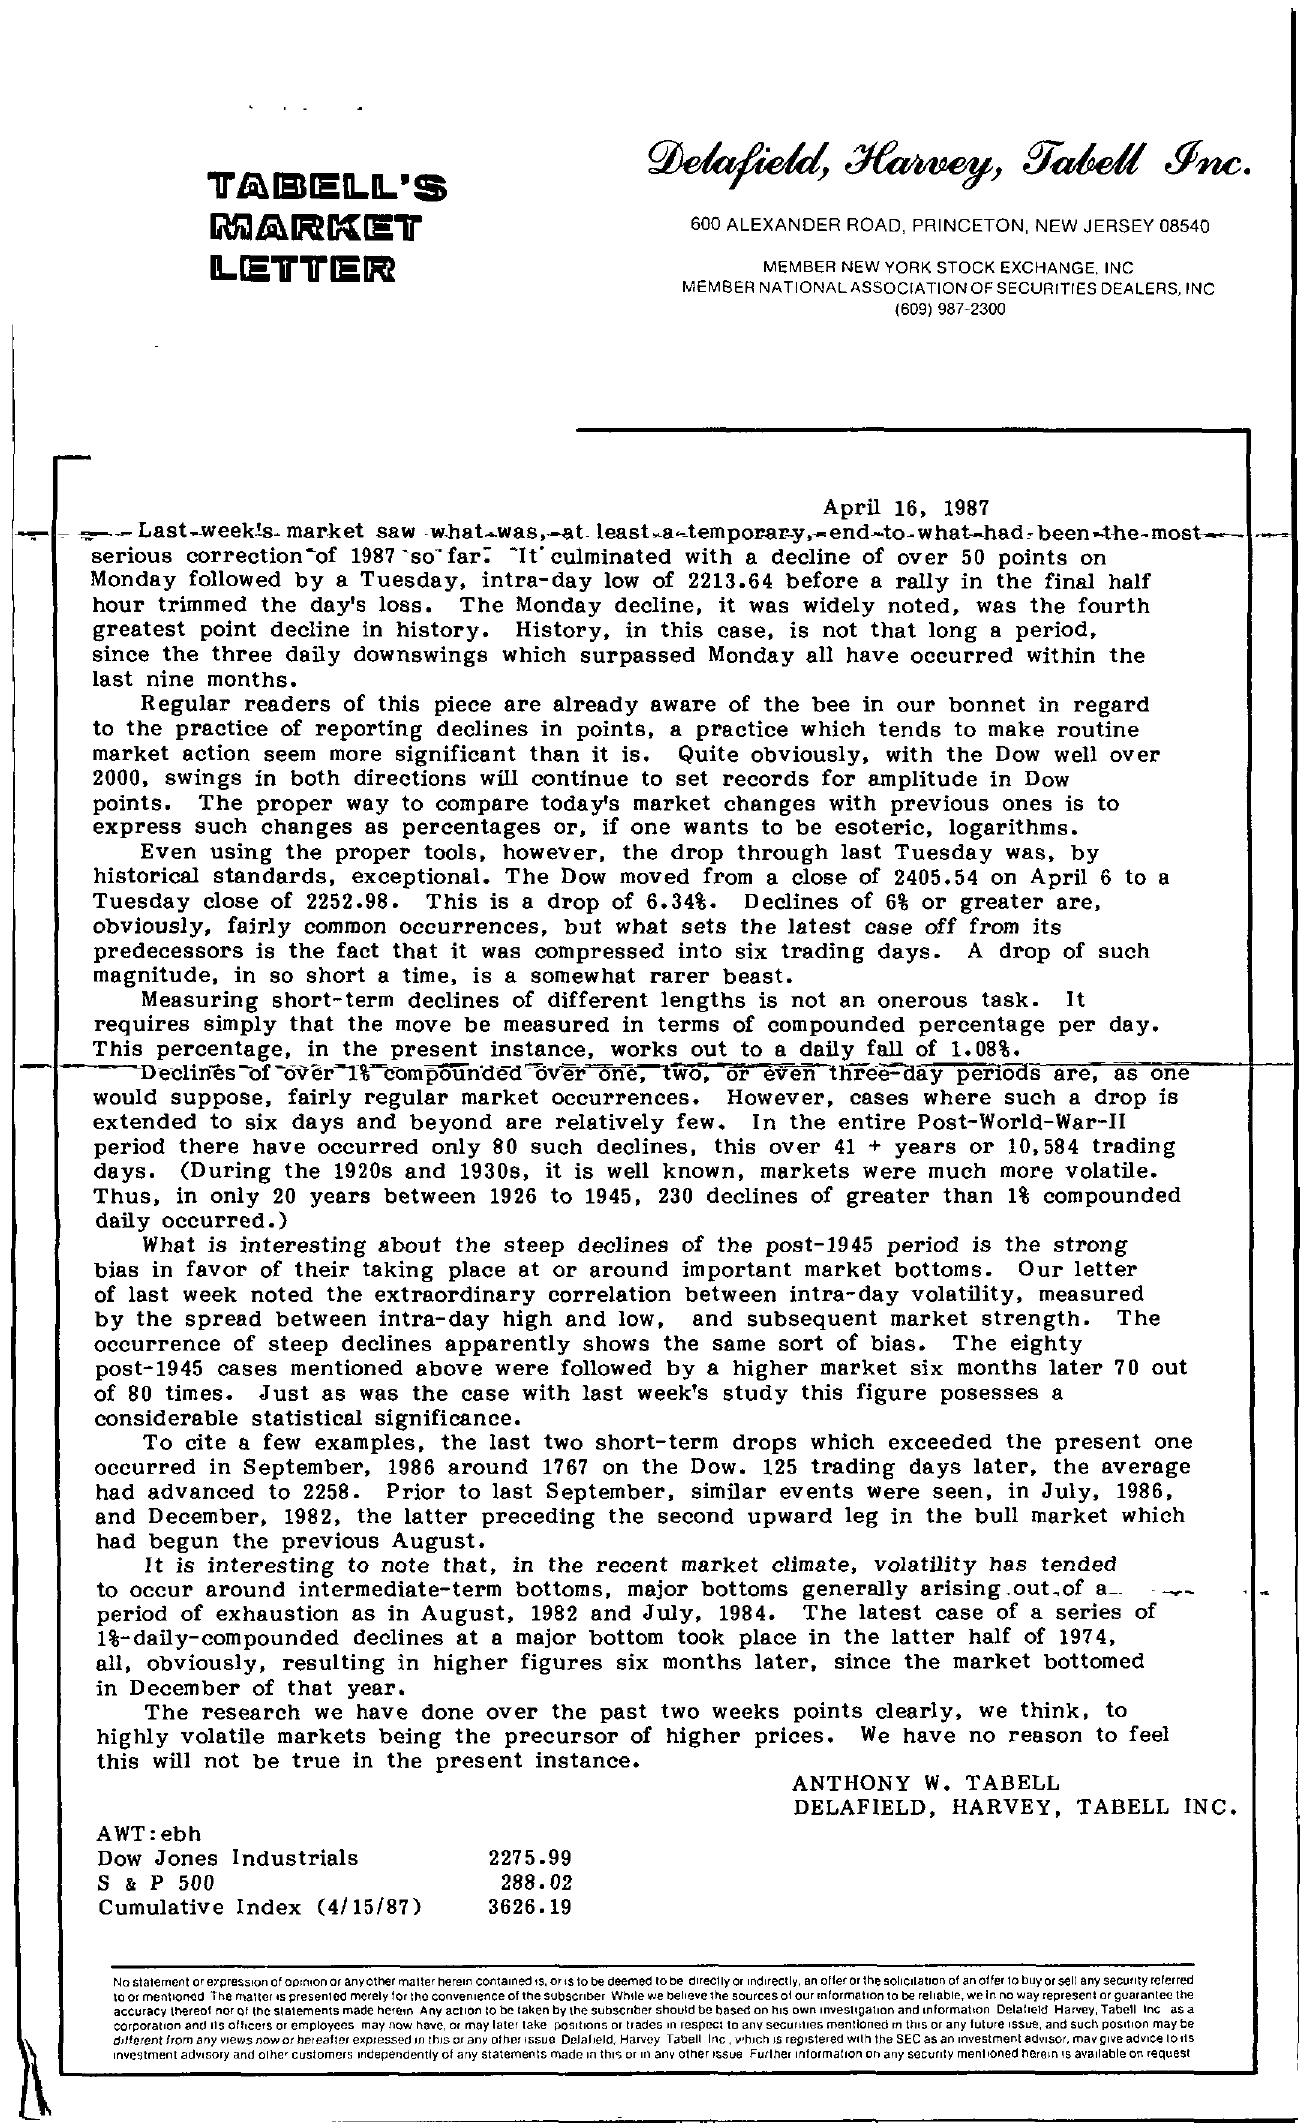 Tabell's Market Letter - April 16, 1987